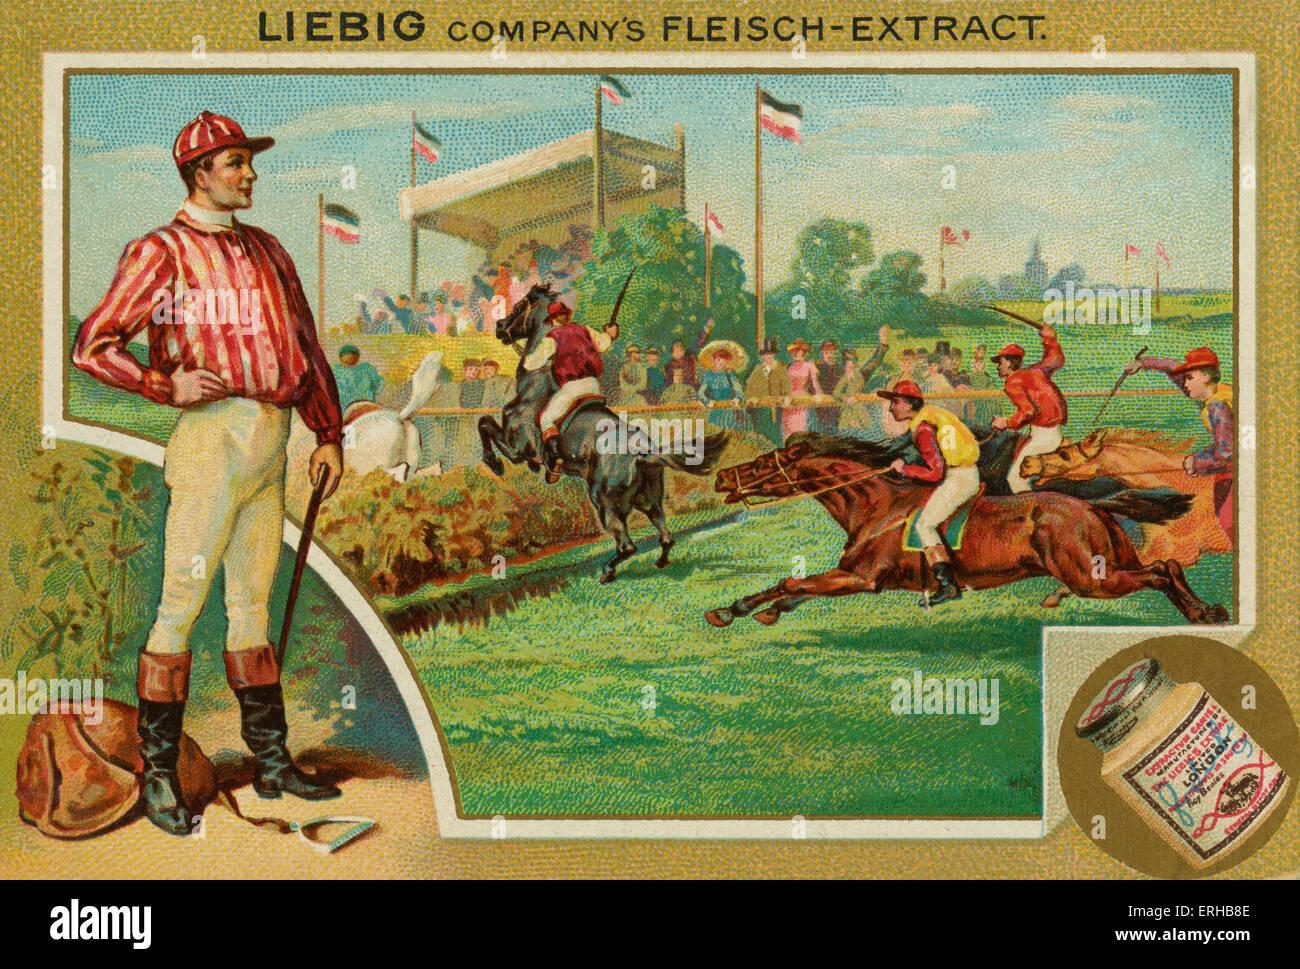 Corse di cavalli. Scheda di Liebig, Sport, 1896. Immagini Stock